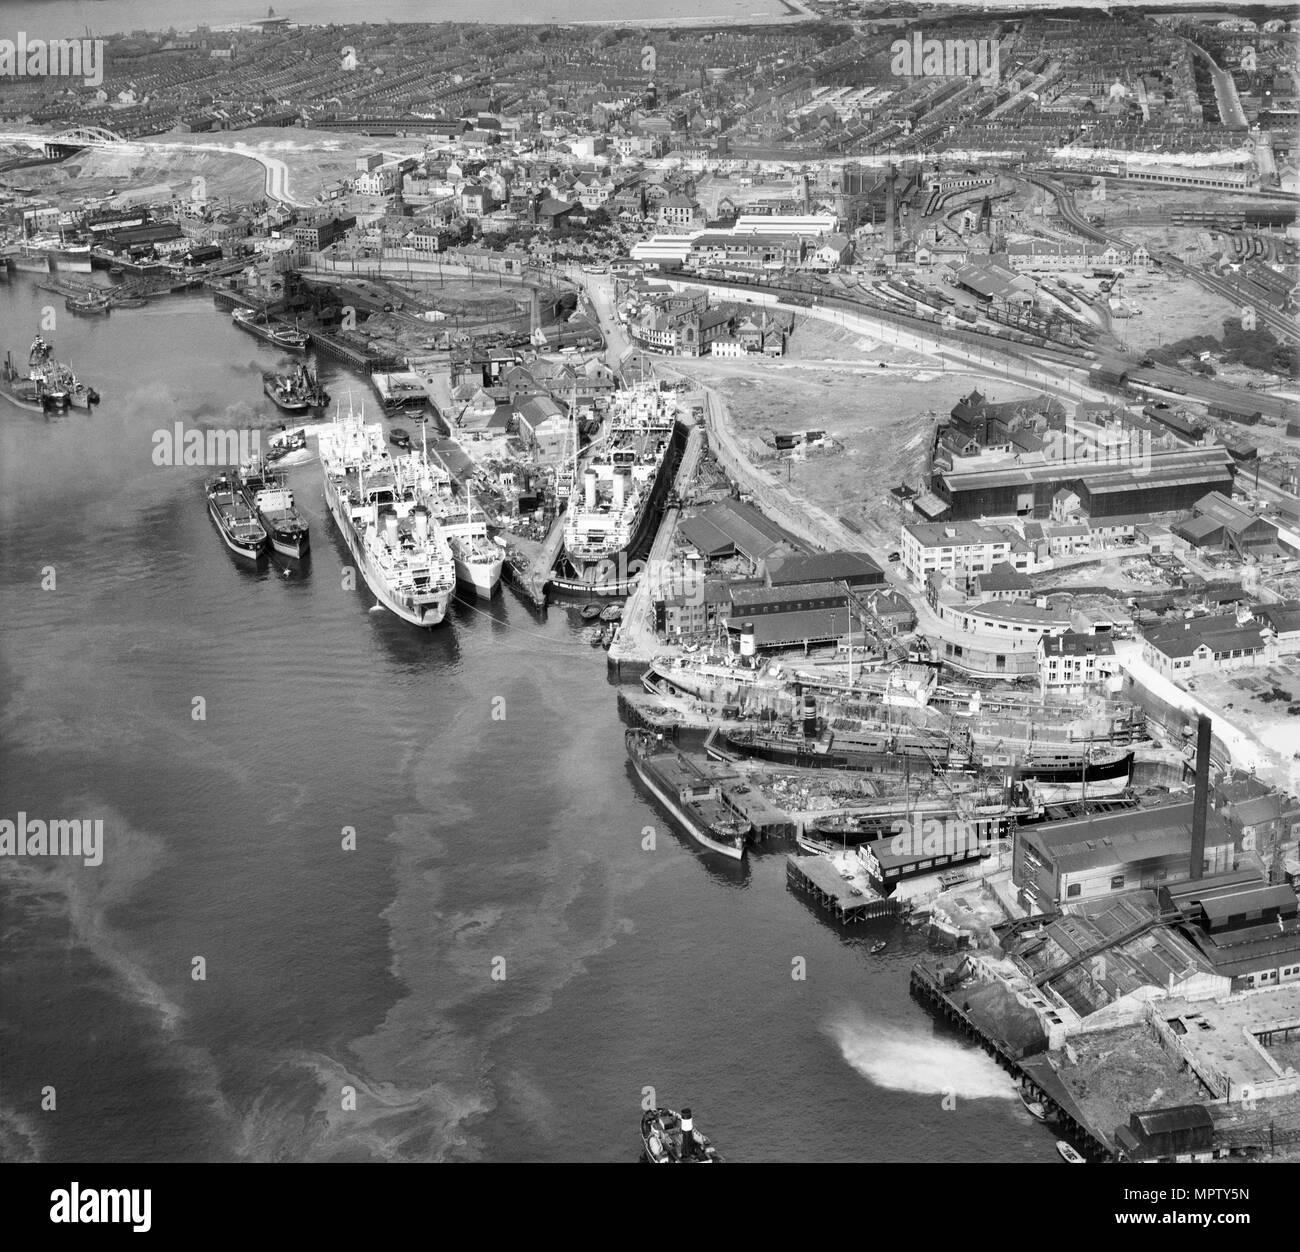 Middle Docks & Engineering Co Ltd Ship Repair Yard, Middle Docks, South Shields, Tyneside, 1947. Artist: Aerofilms. - Stock Image